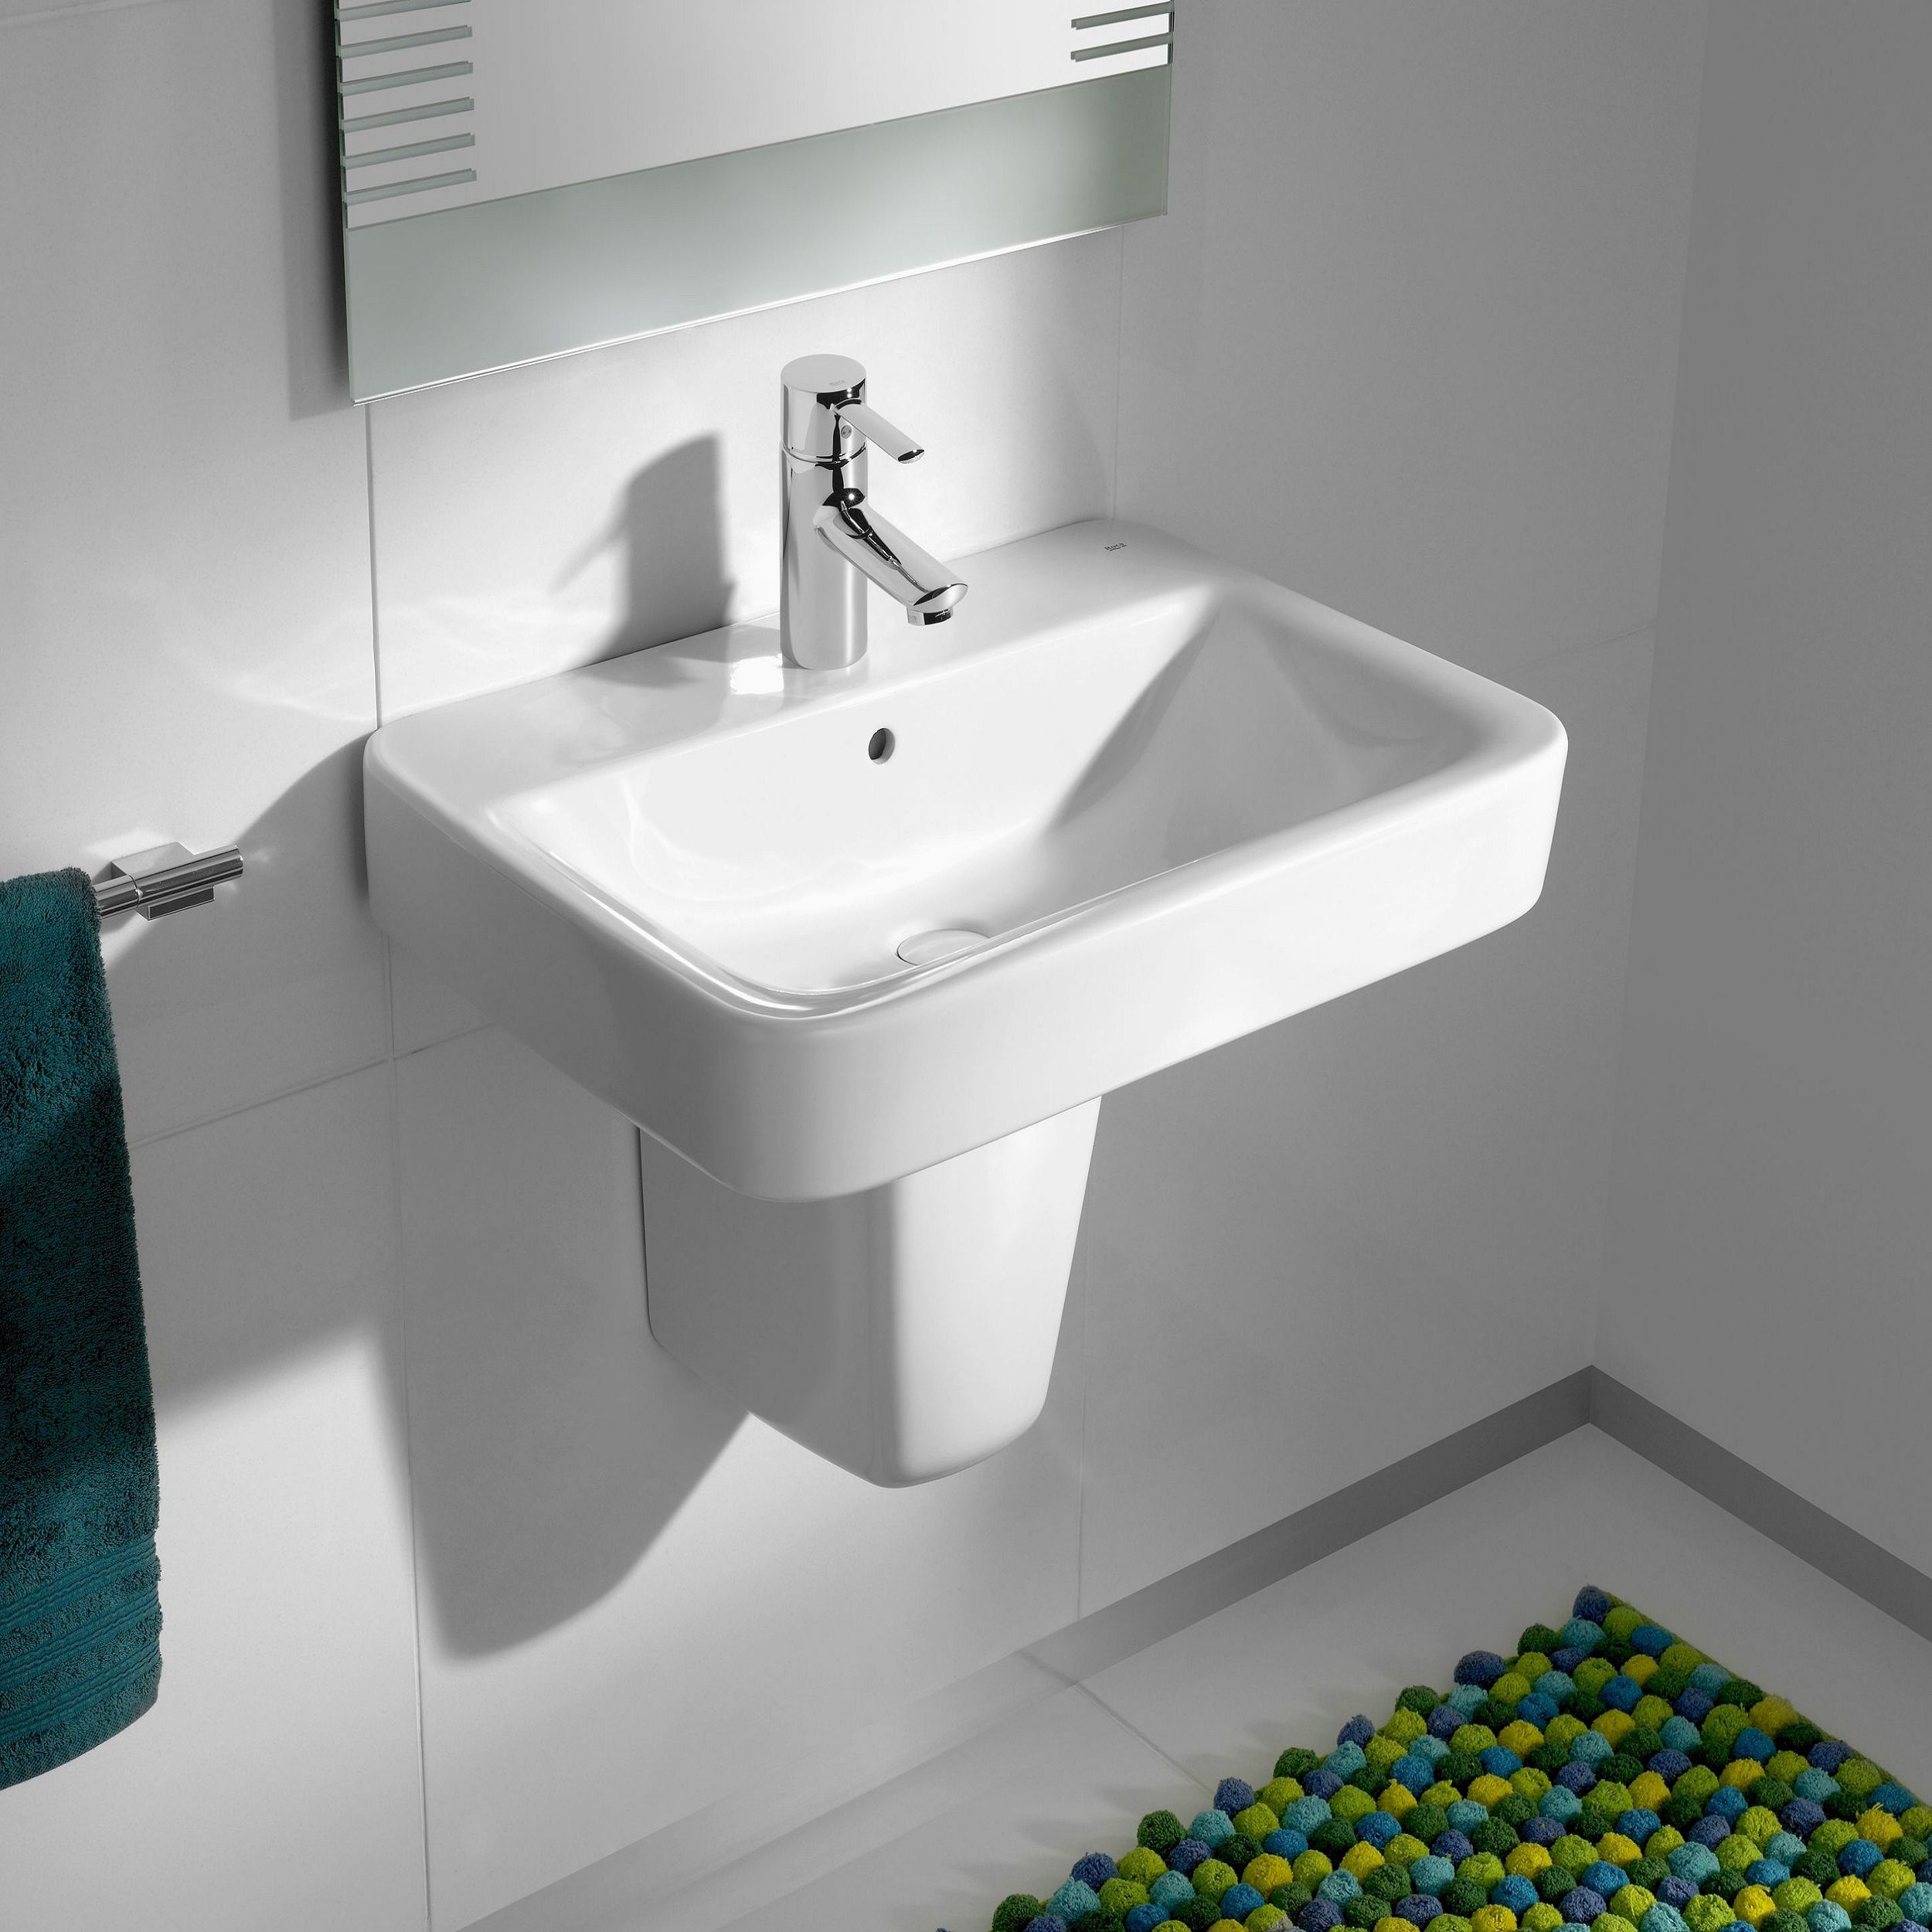 Bathroom Toilets Basins Toilet Sink Complete Bathroom Packages Deals City Plumbing Supplies